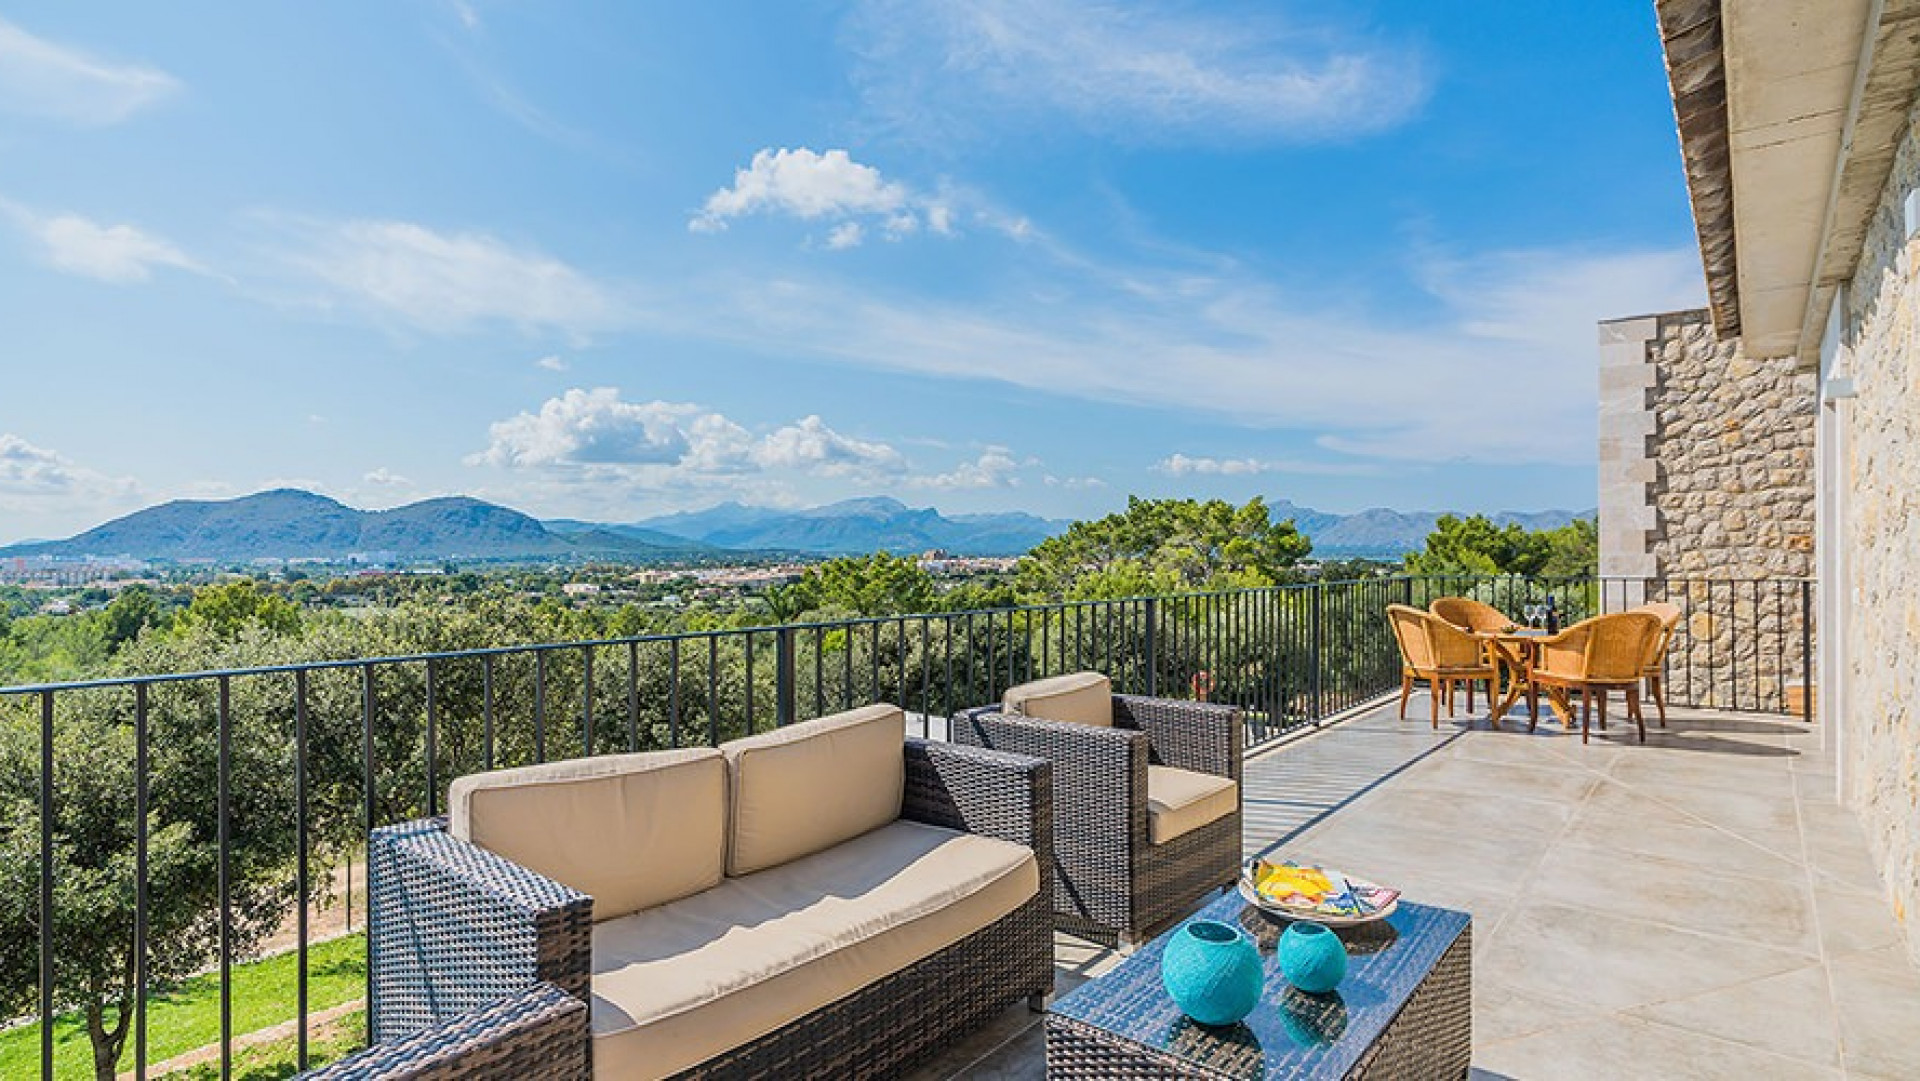 6 Bedroom Villa Alcudia Luxury Villa with Pool and Beautiful Views